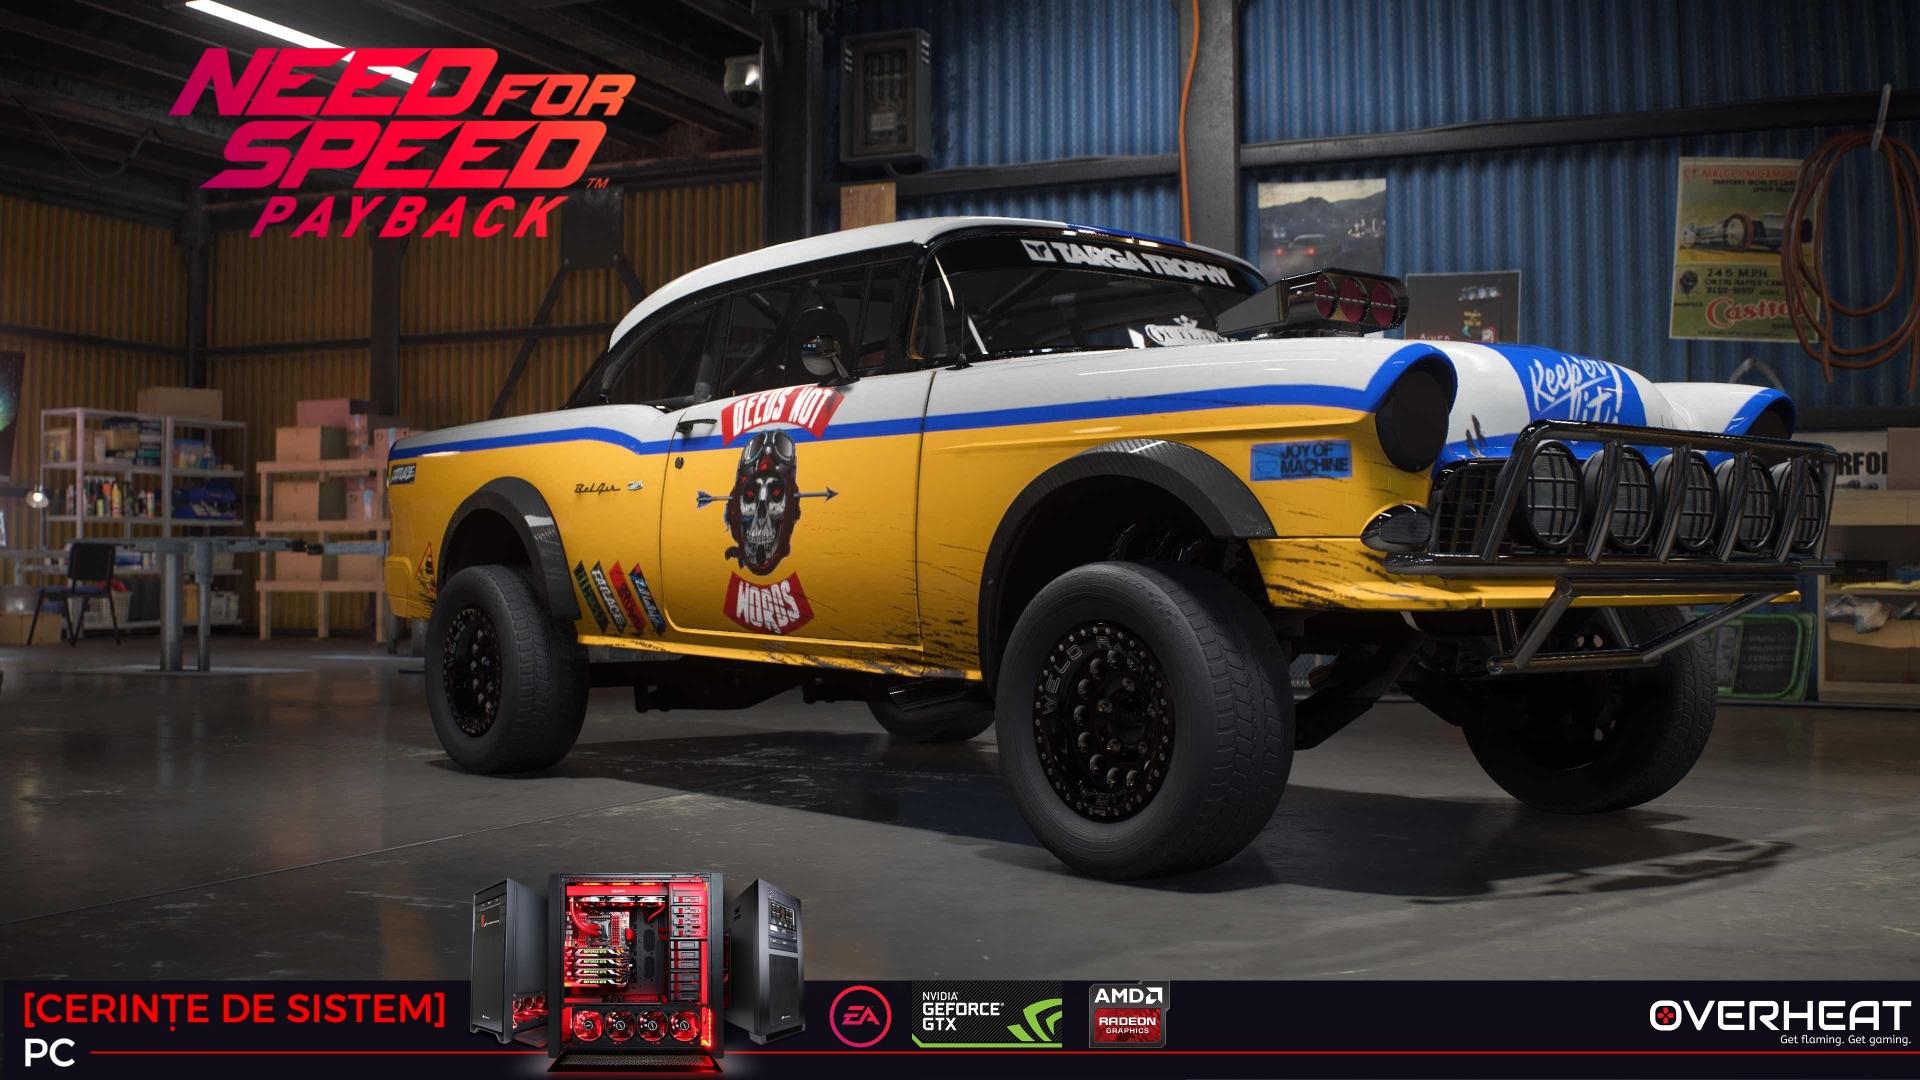 Need for Speed Payback cerinte de sistem